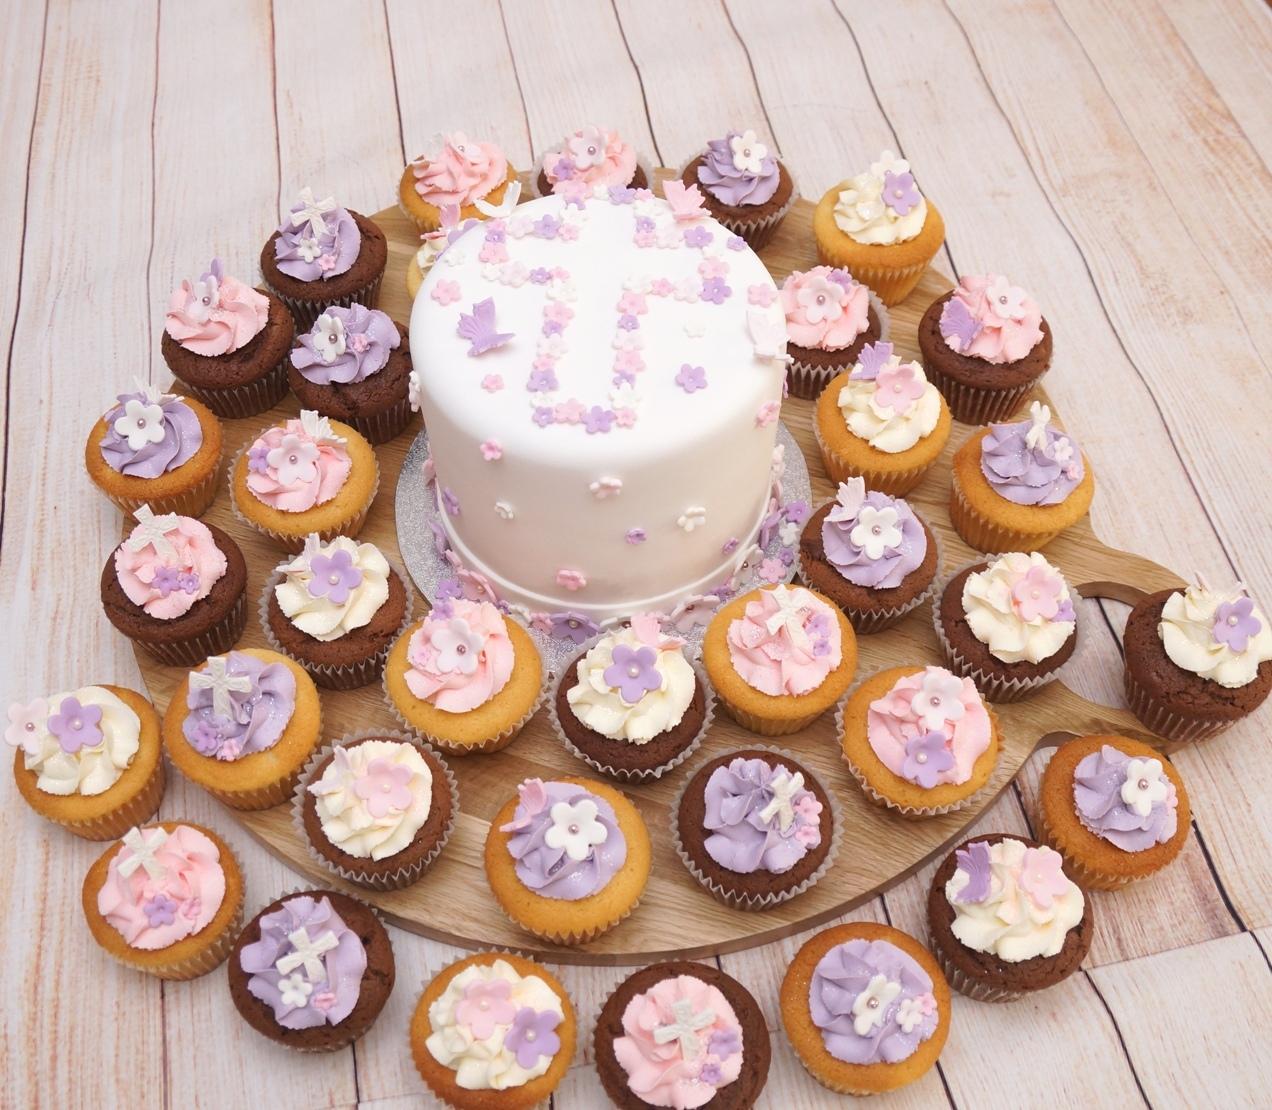 Christening Cake with flower cross 2